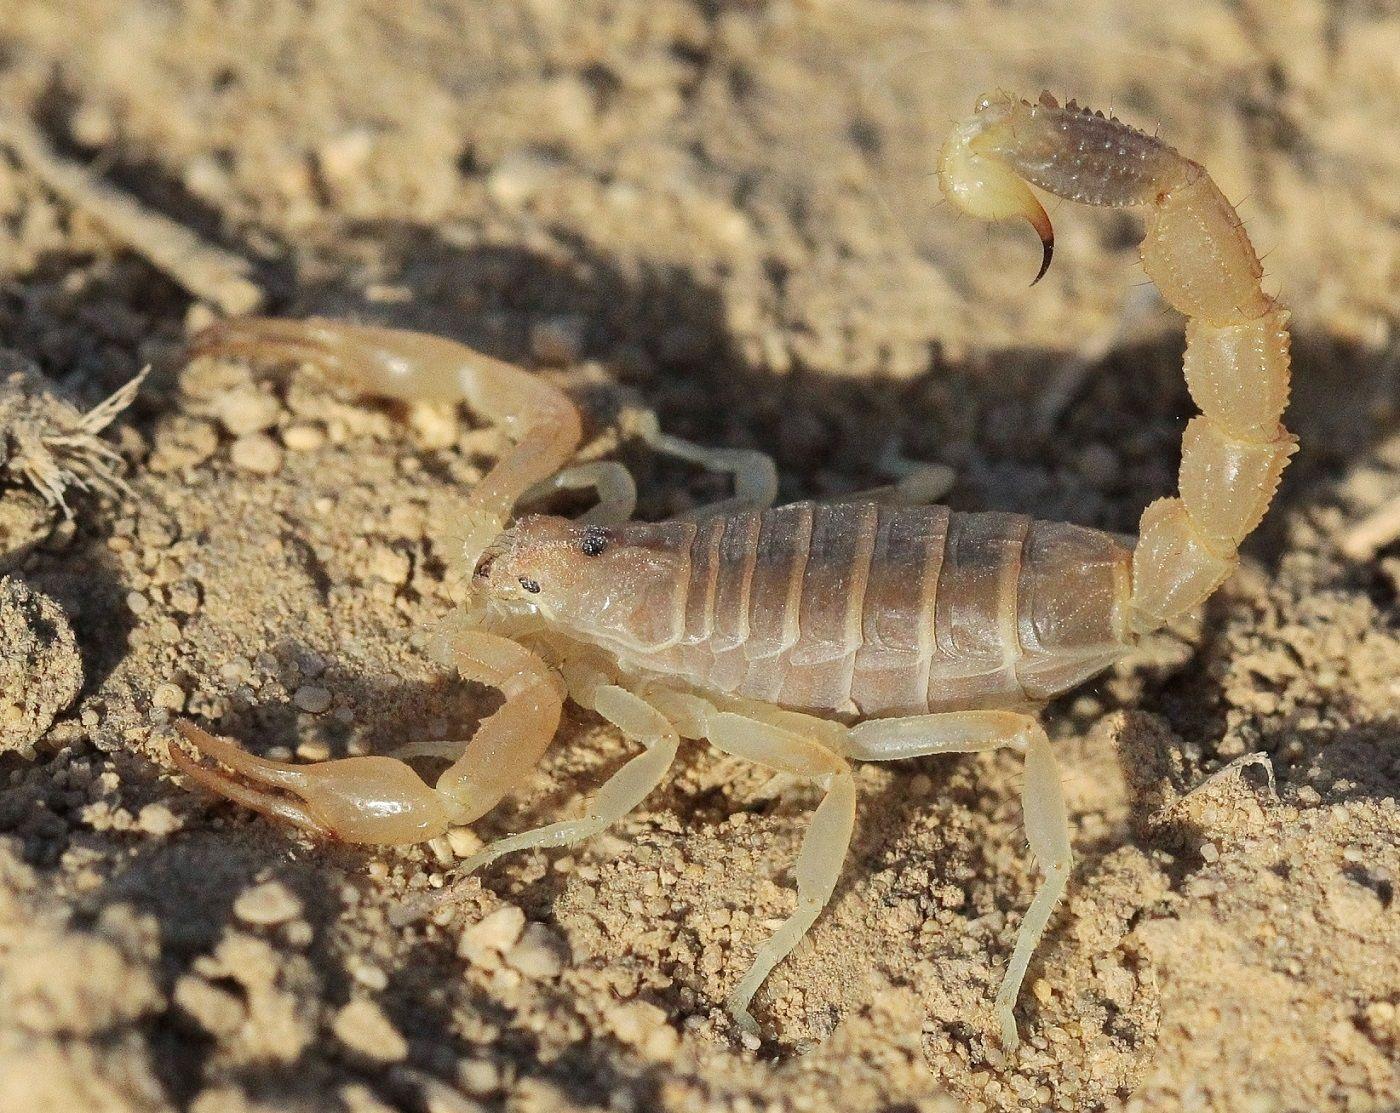 пестрый скорпион фото пляжи здесь